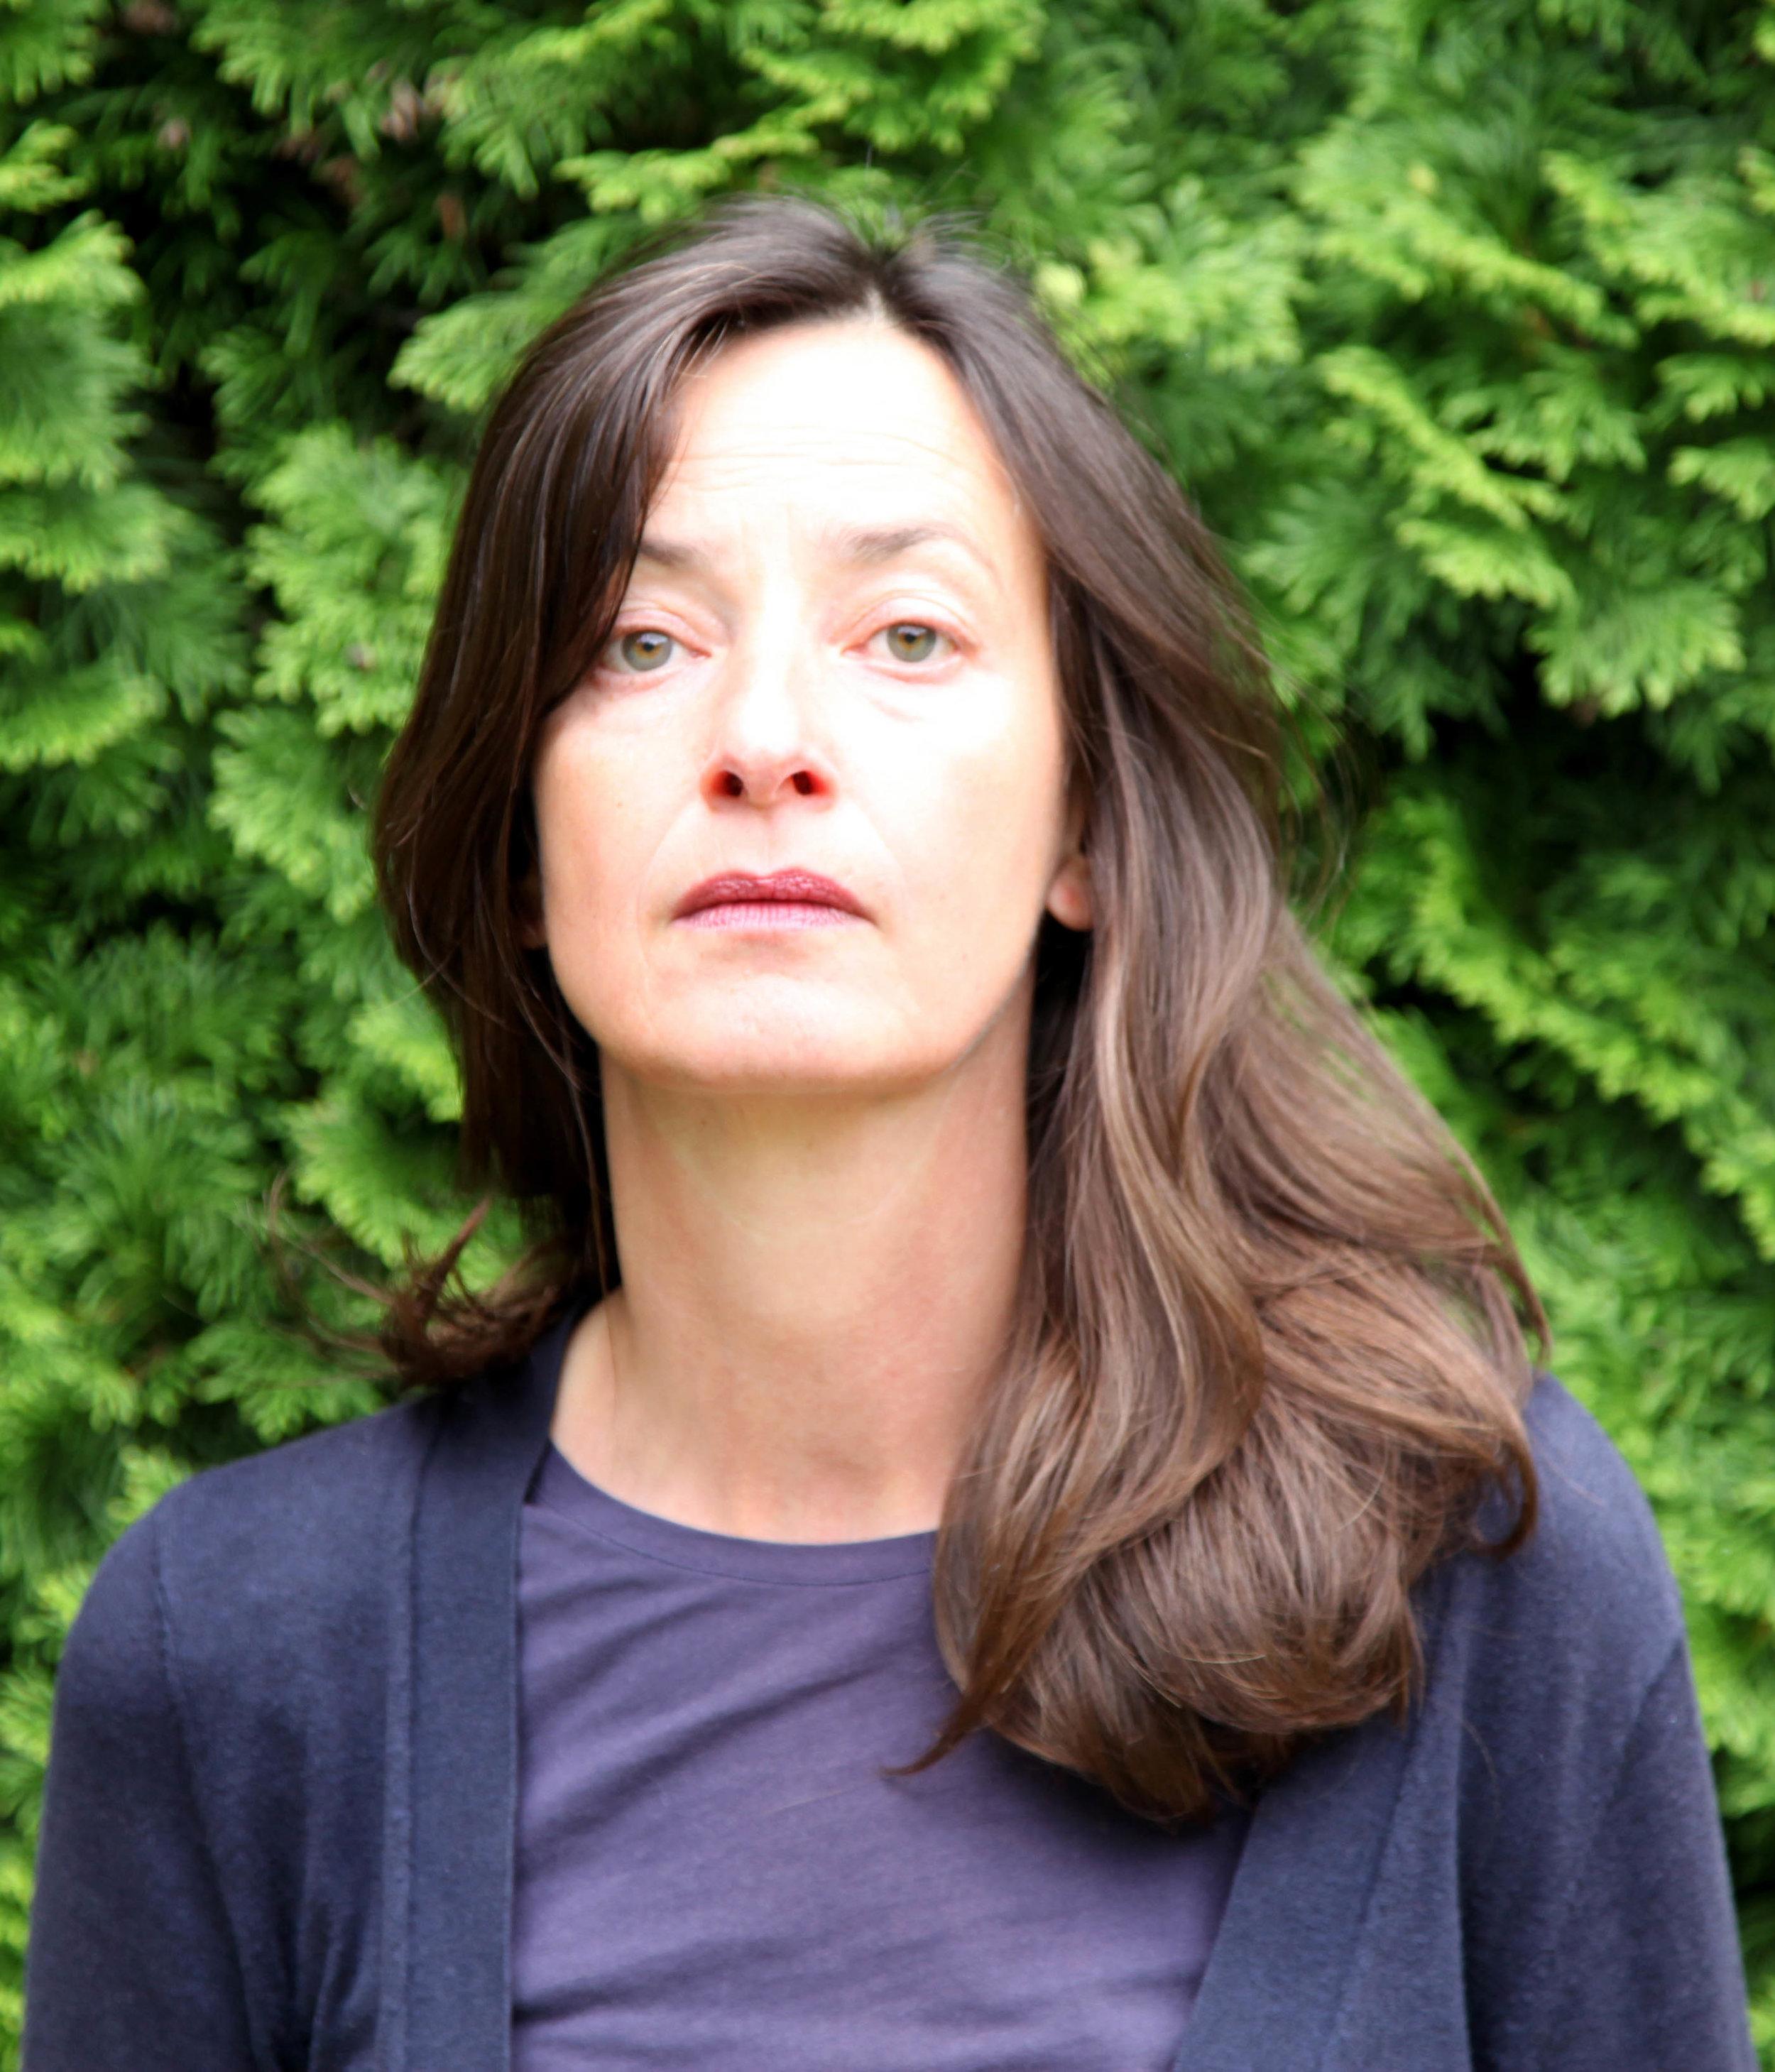 Kellndorfer_portrait 2.jpg